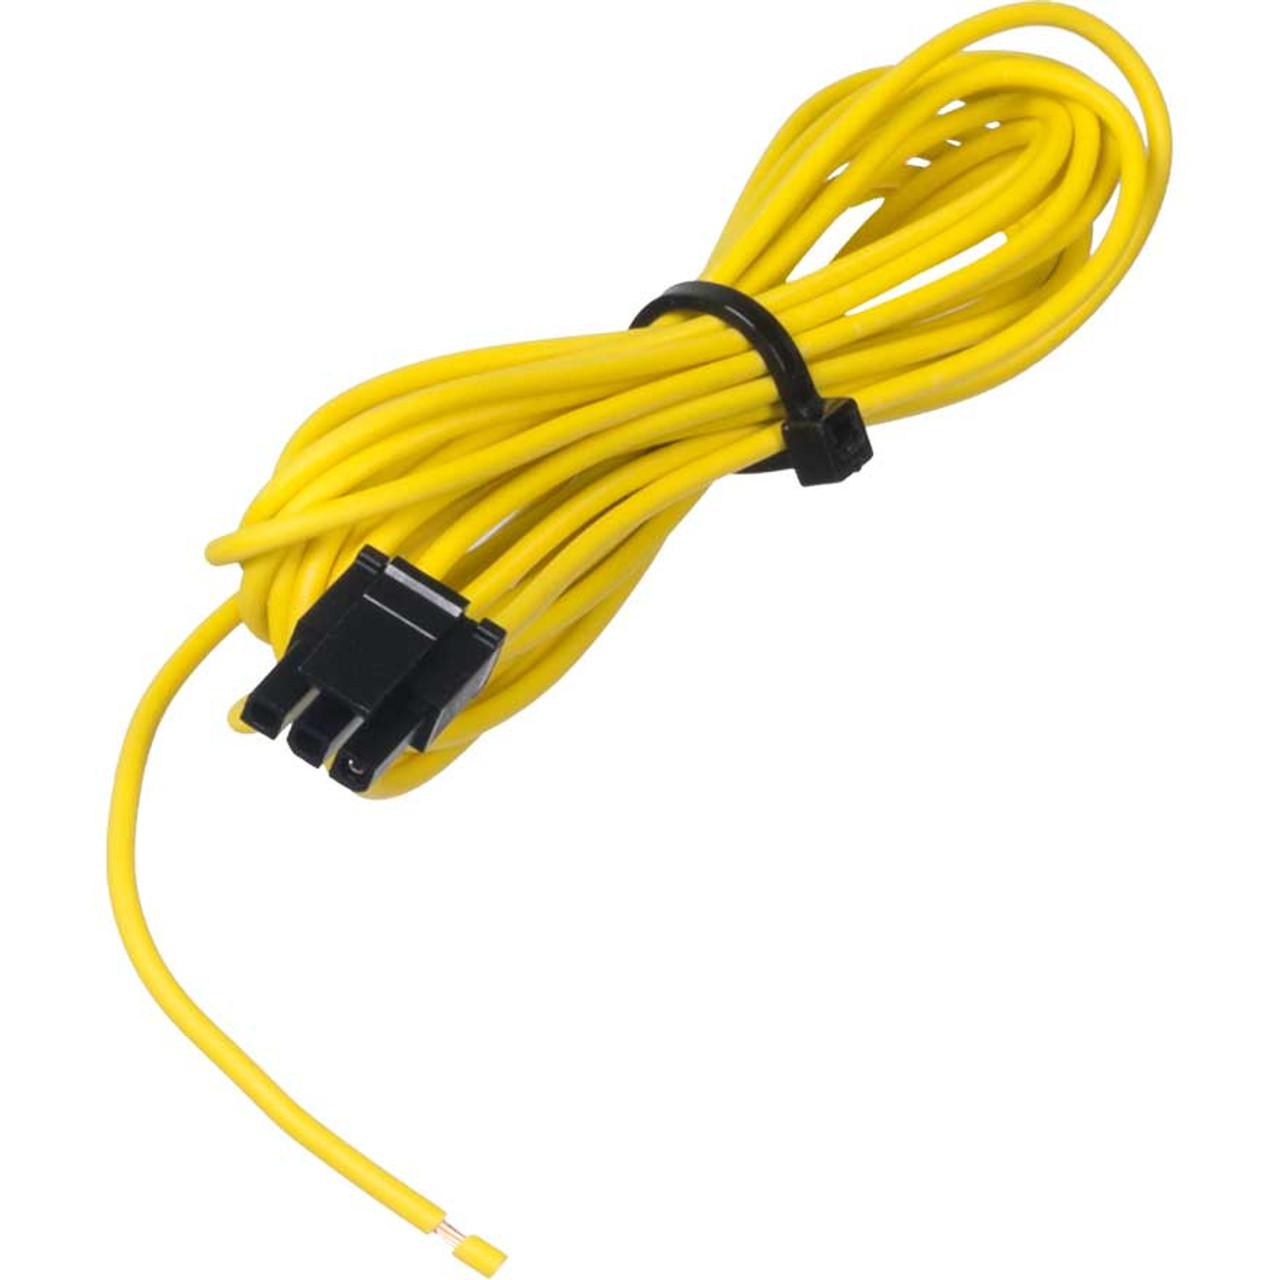 Wiring Harness (1 Wire)